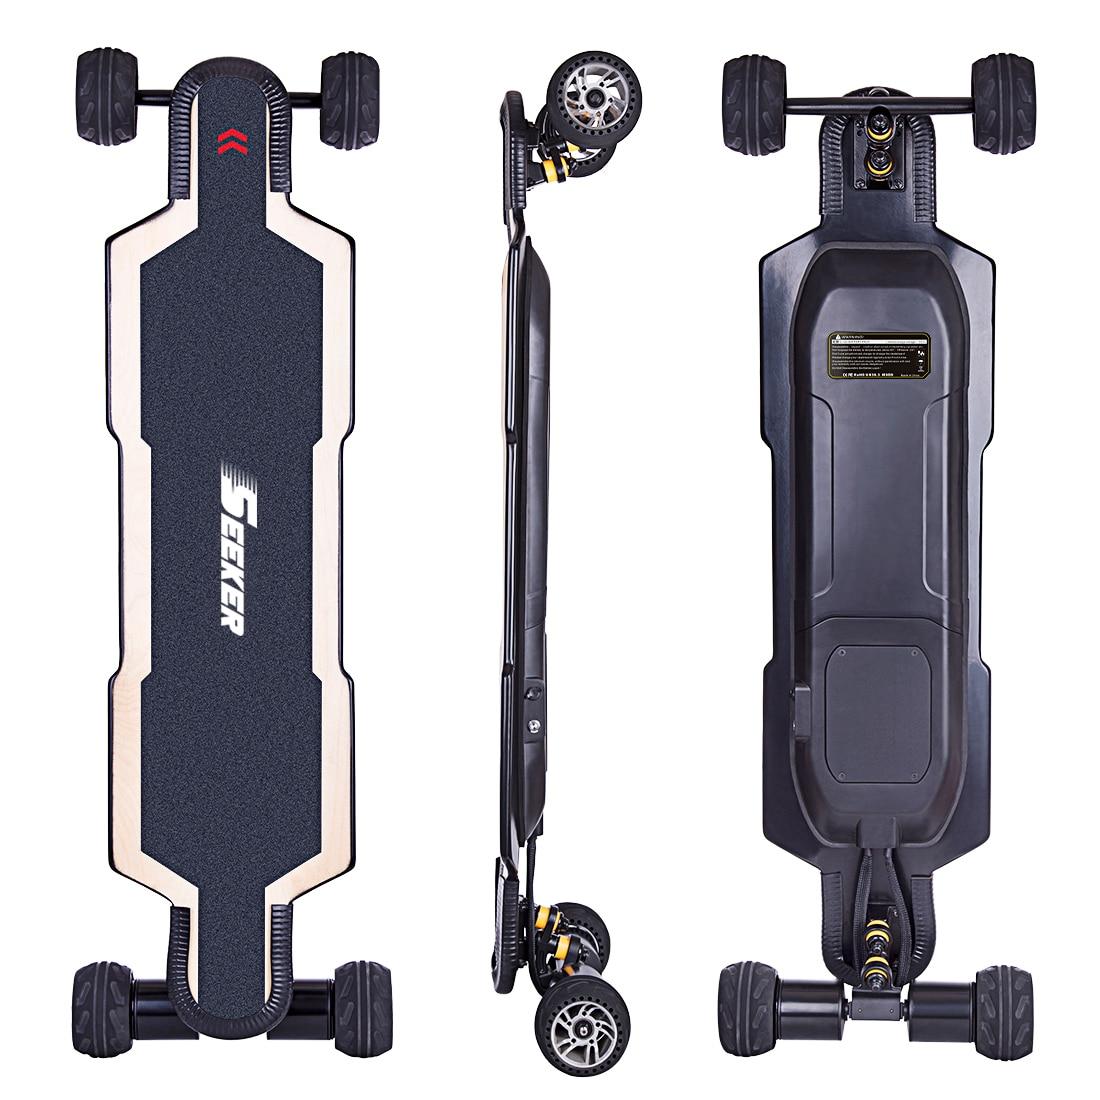 New Hot SEEKERS BRT-02 4-Wheel Electric Skateboard - AU Plug